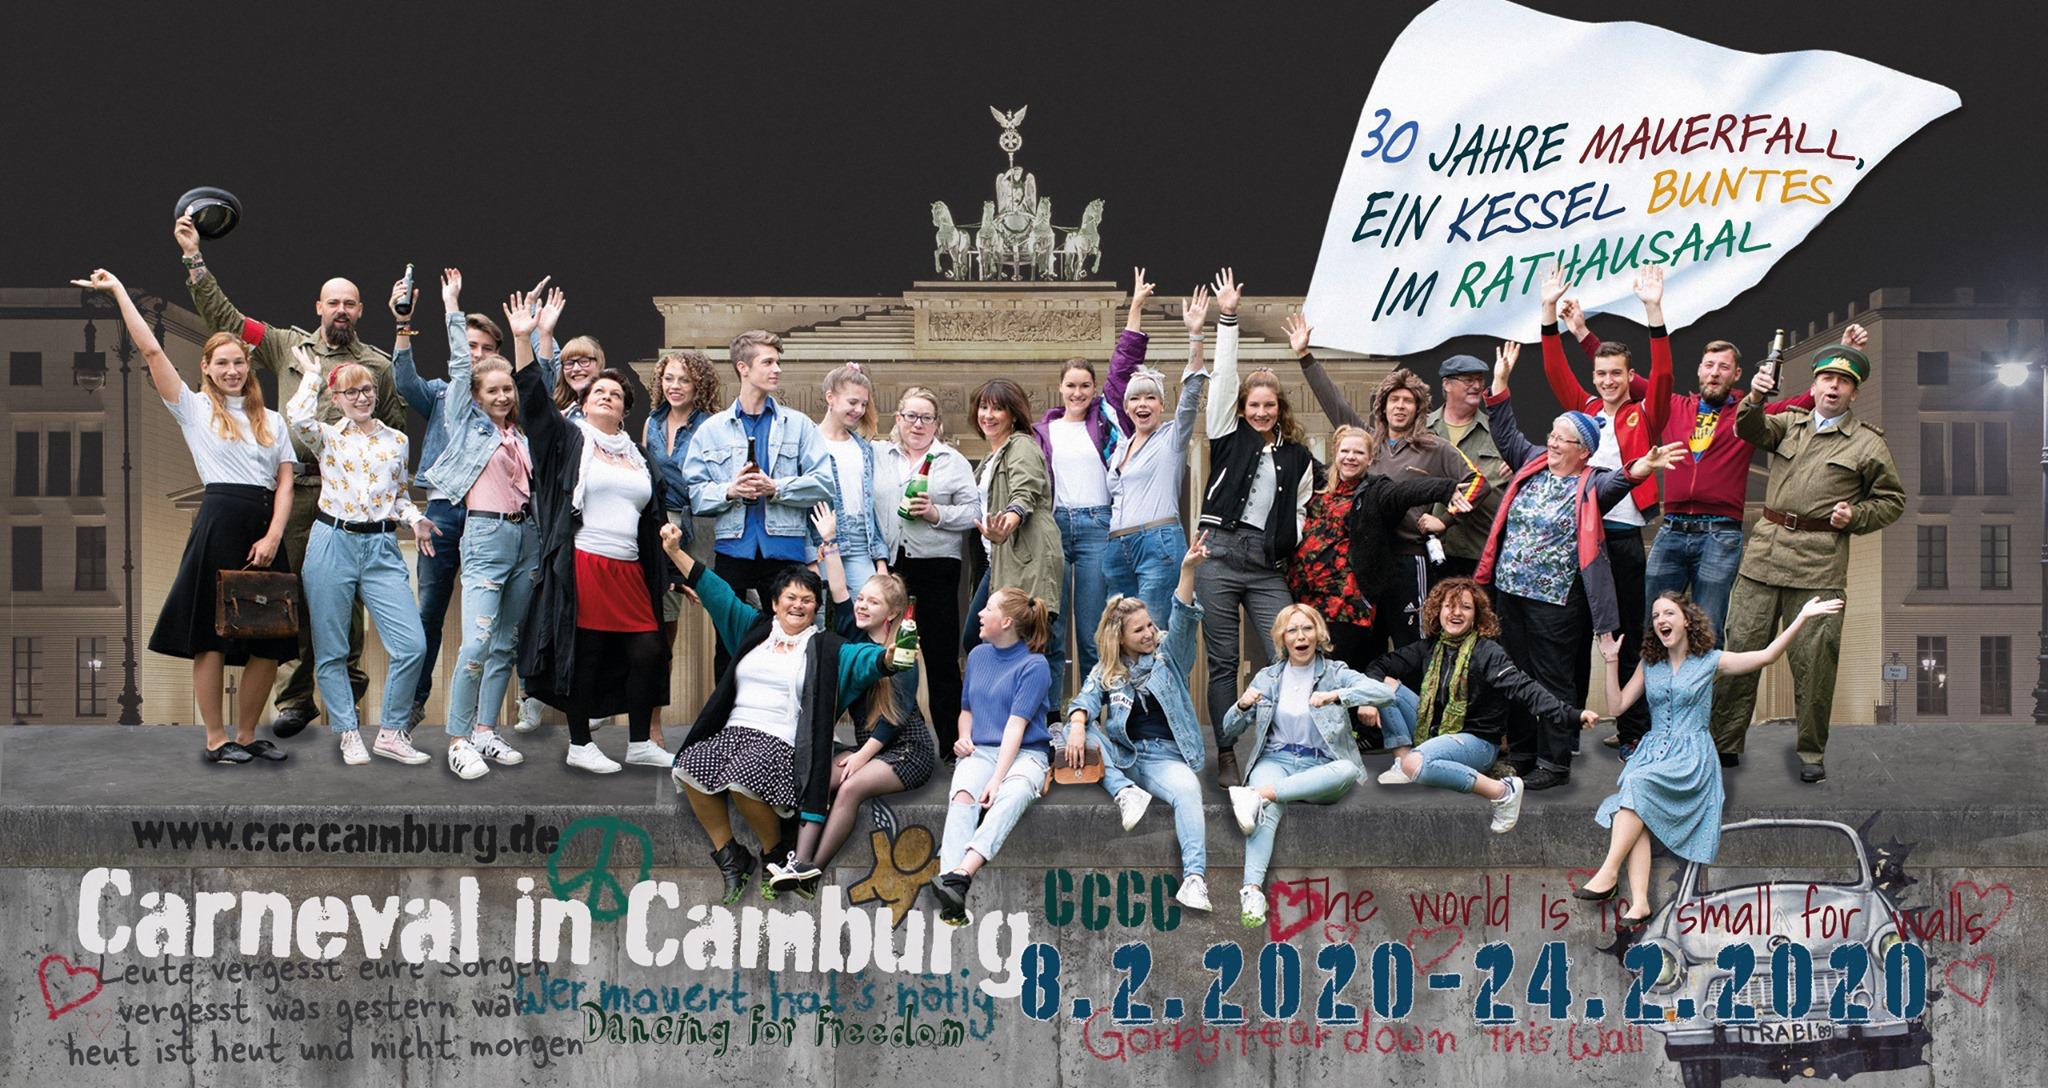 Abholung des CCCC Faschings-Prinzenpaares @ Bahnhof Camburg